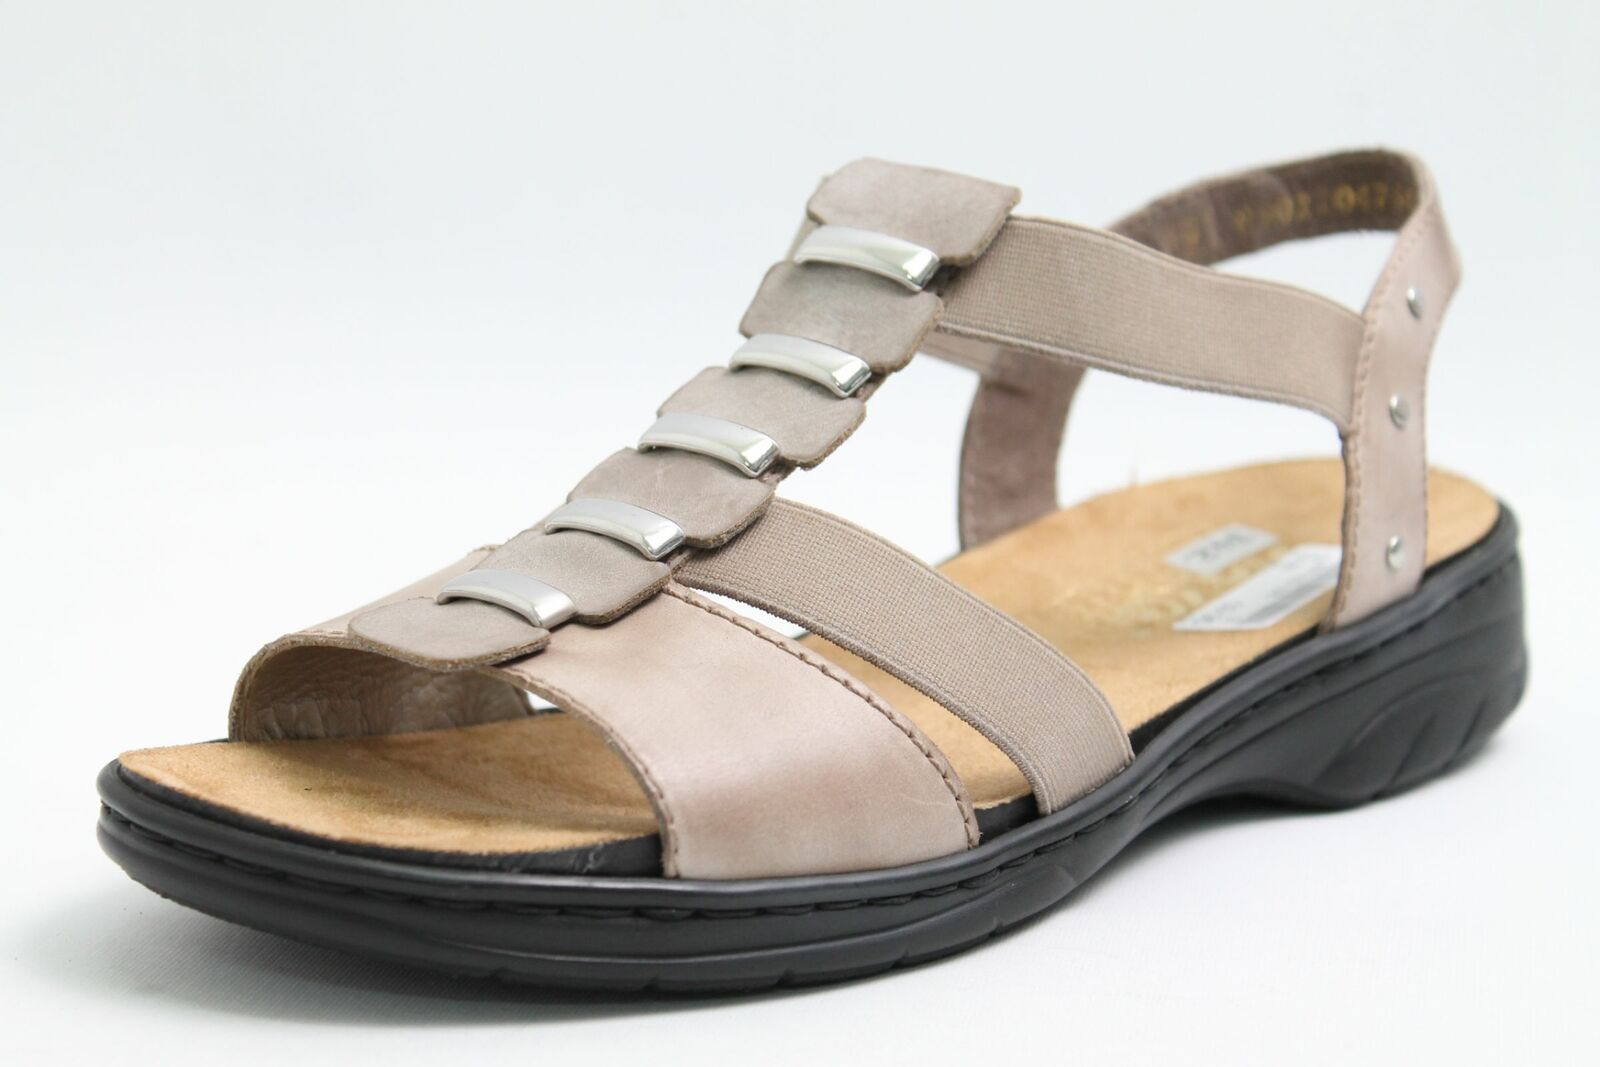 Rieker Sandaletten grau Leder finished Applikation Vario Wechselfußbett Damen